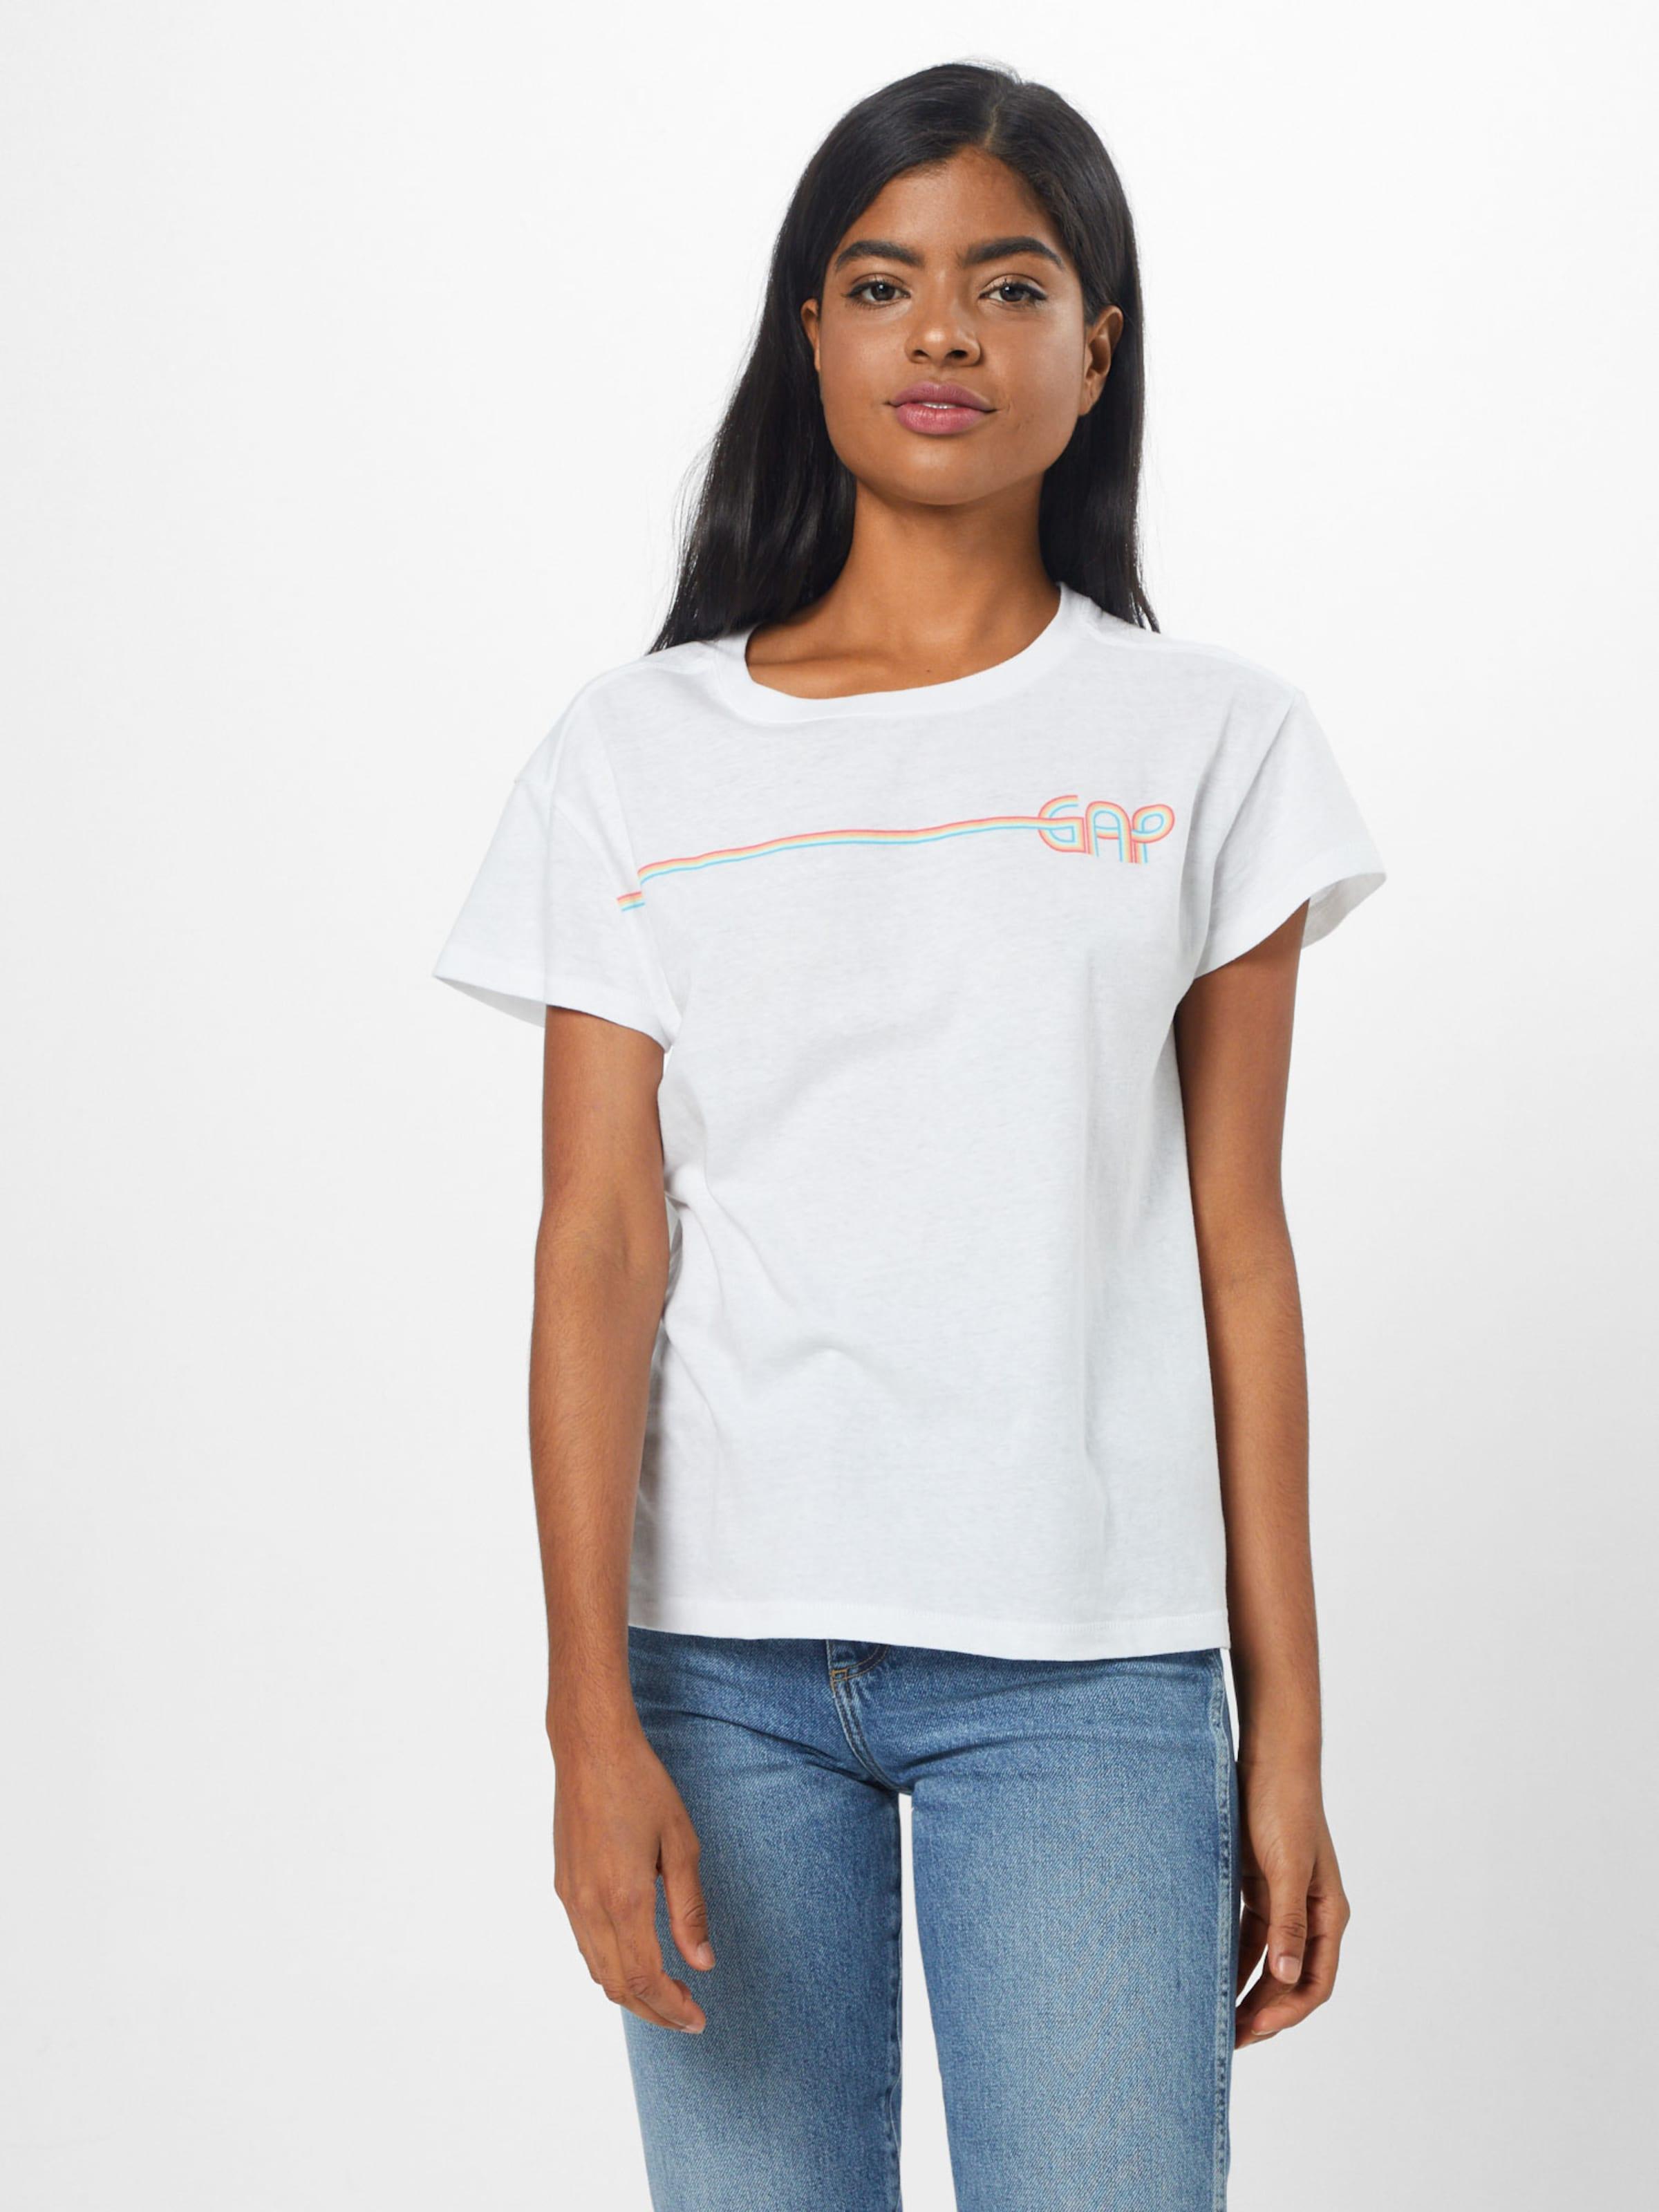 Gap Blanc T shirt T En En T shirt Gap Blanc Gap 7ybf6Yg